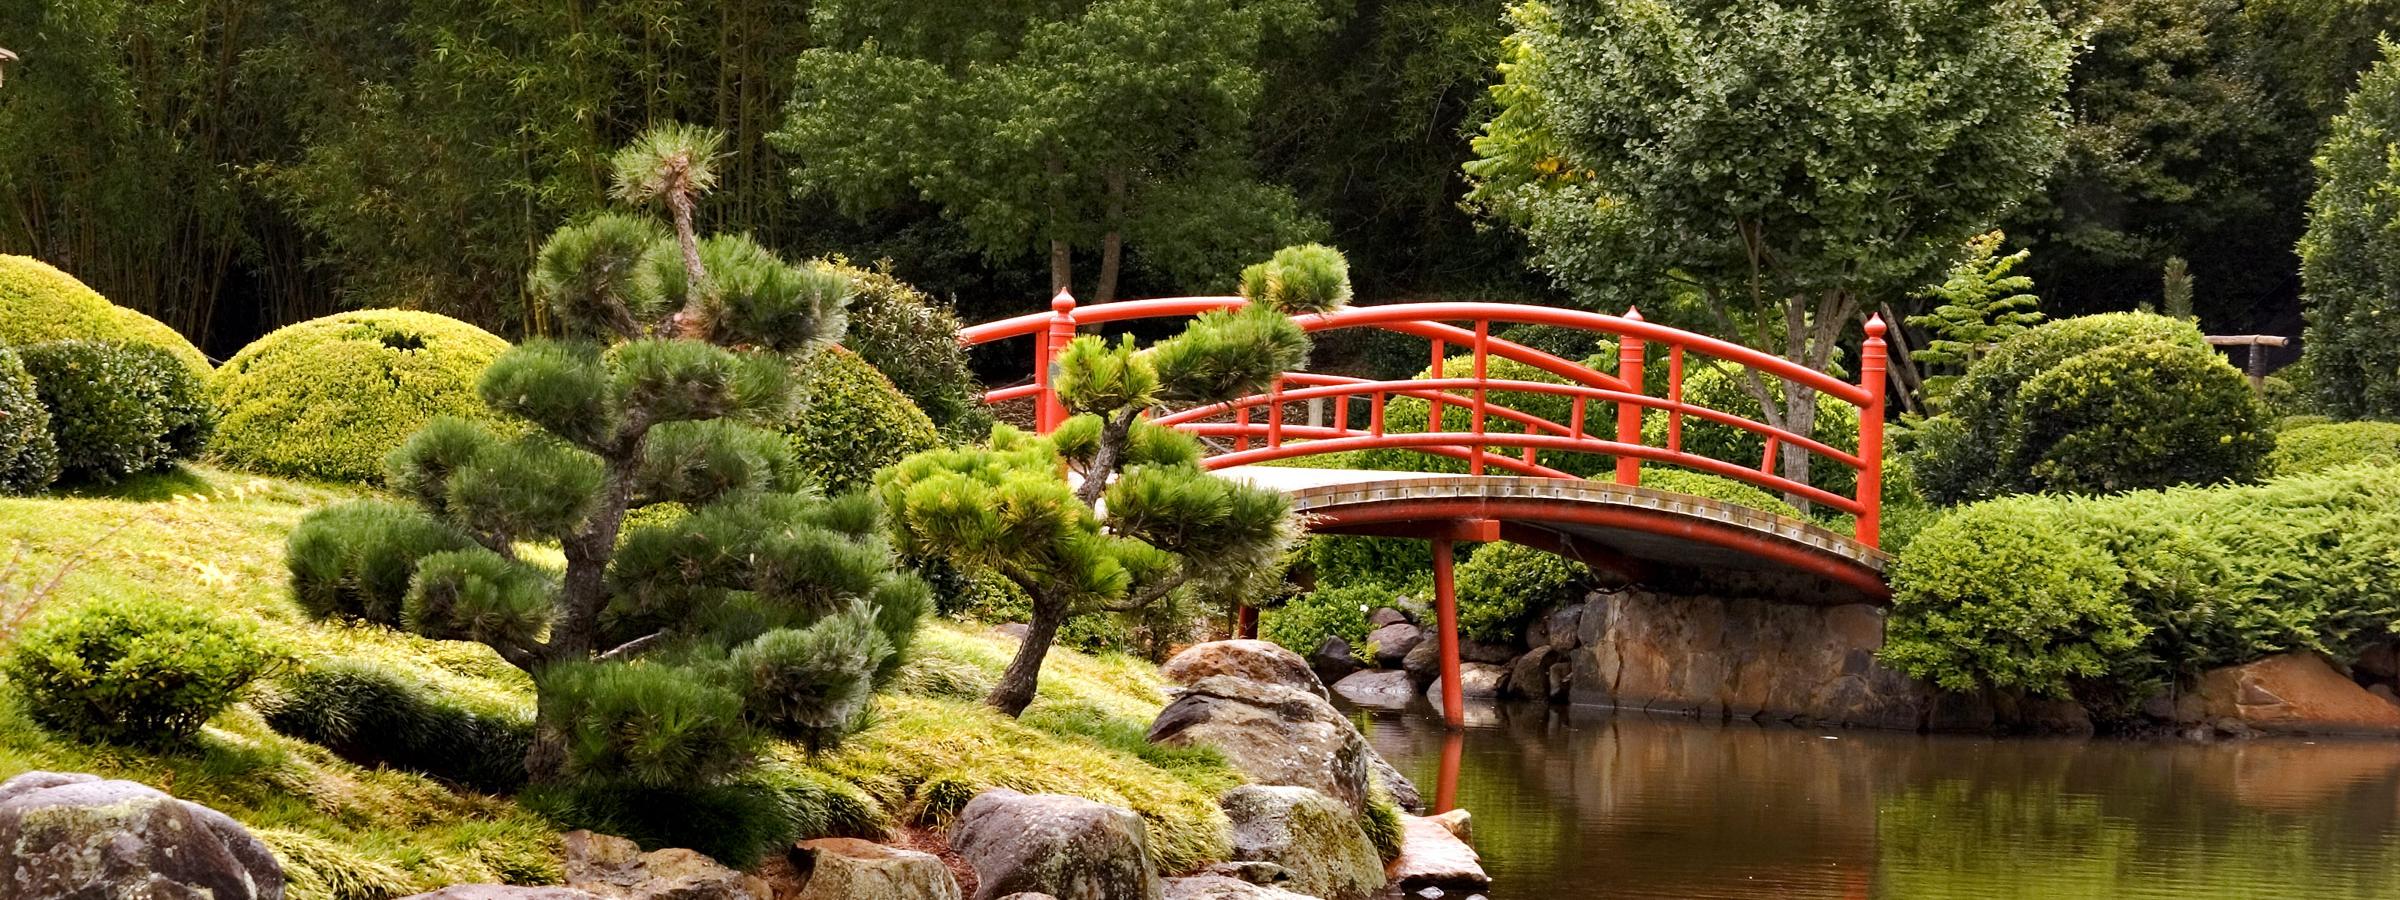 bigstock-Japanese-Gardens-77434 copy.jpg